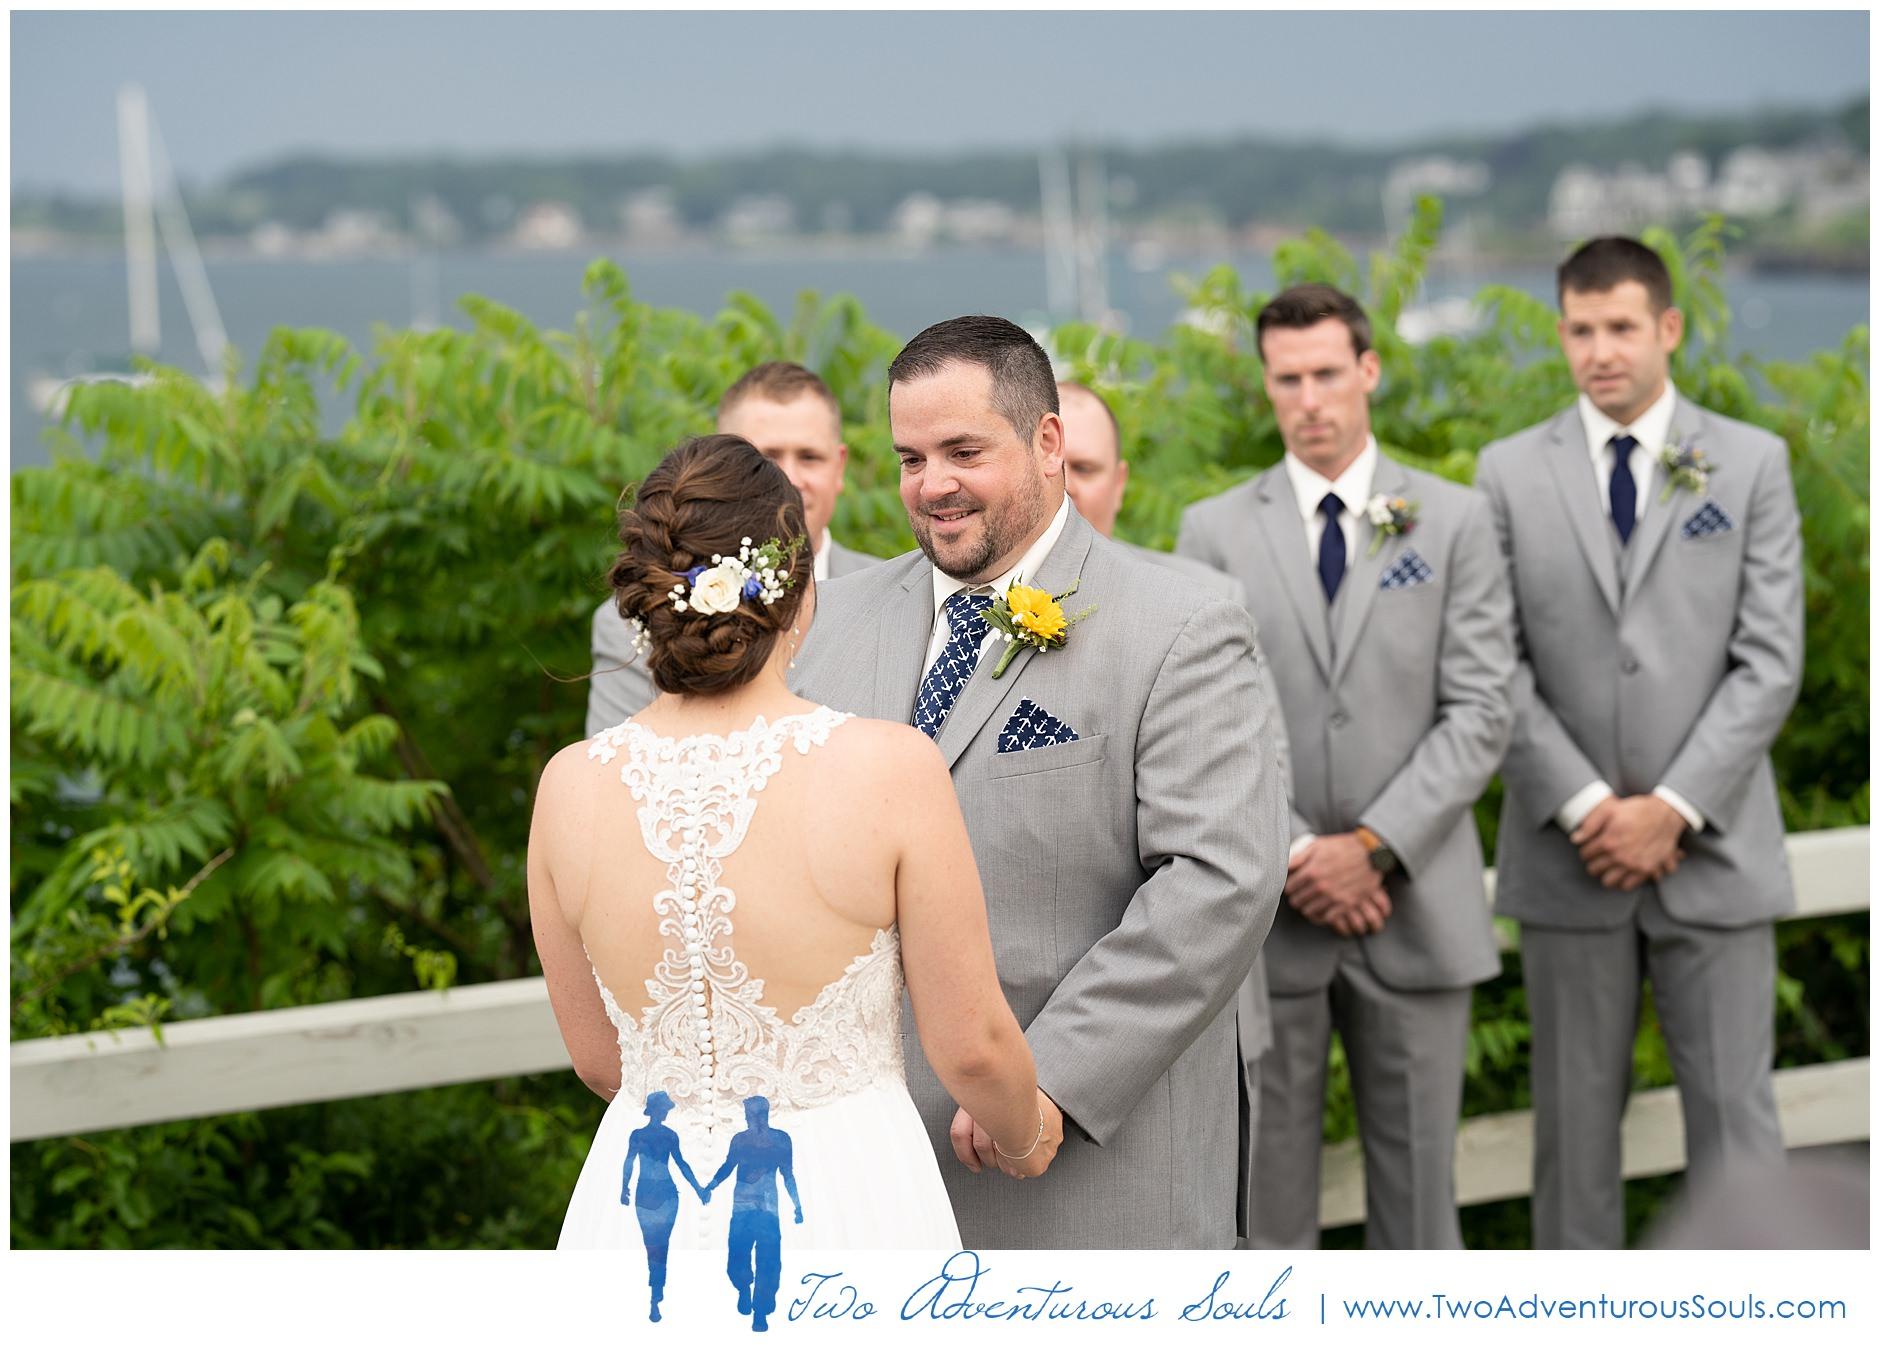 Maine Wedding Photographers, SMCC Wedding Photographers, Southern Maine Community College Wedding Photographers, Two Adventurous Souls-AshleyAaron_0025.jpg